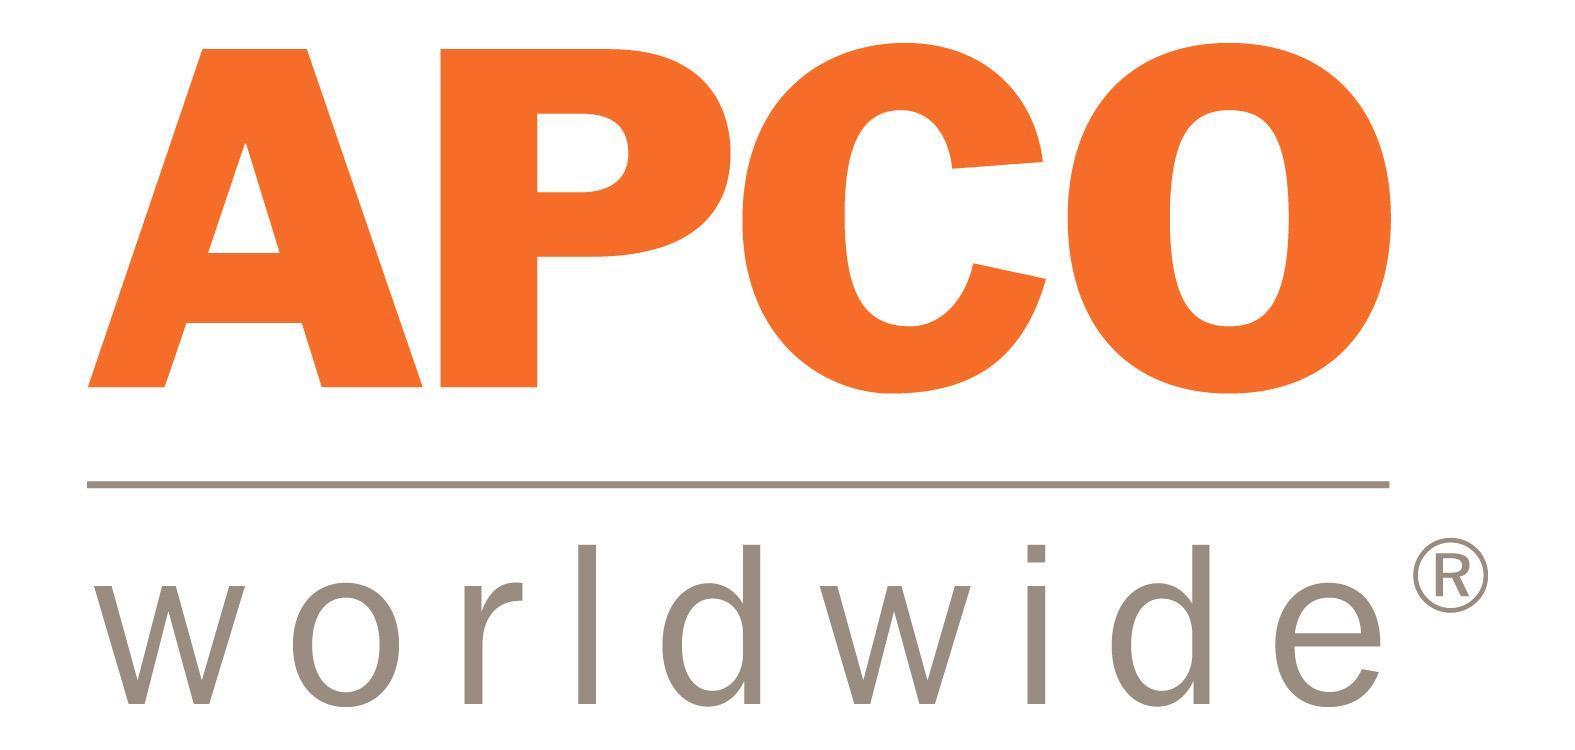 APCO Worldwide company logo